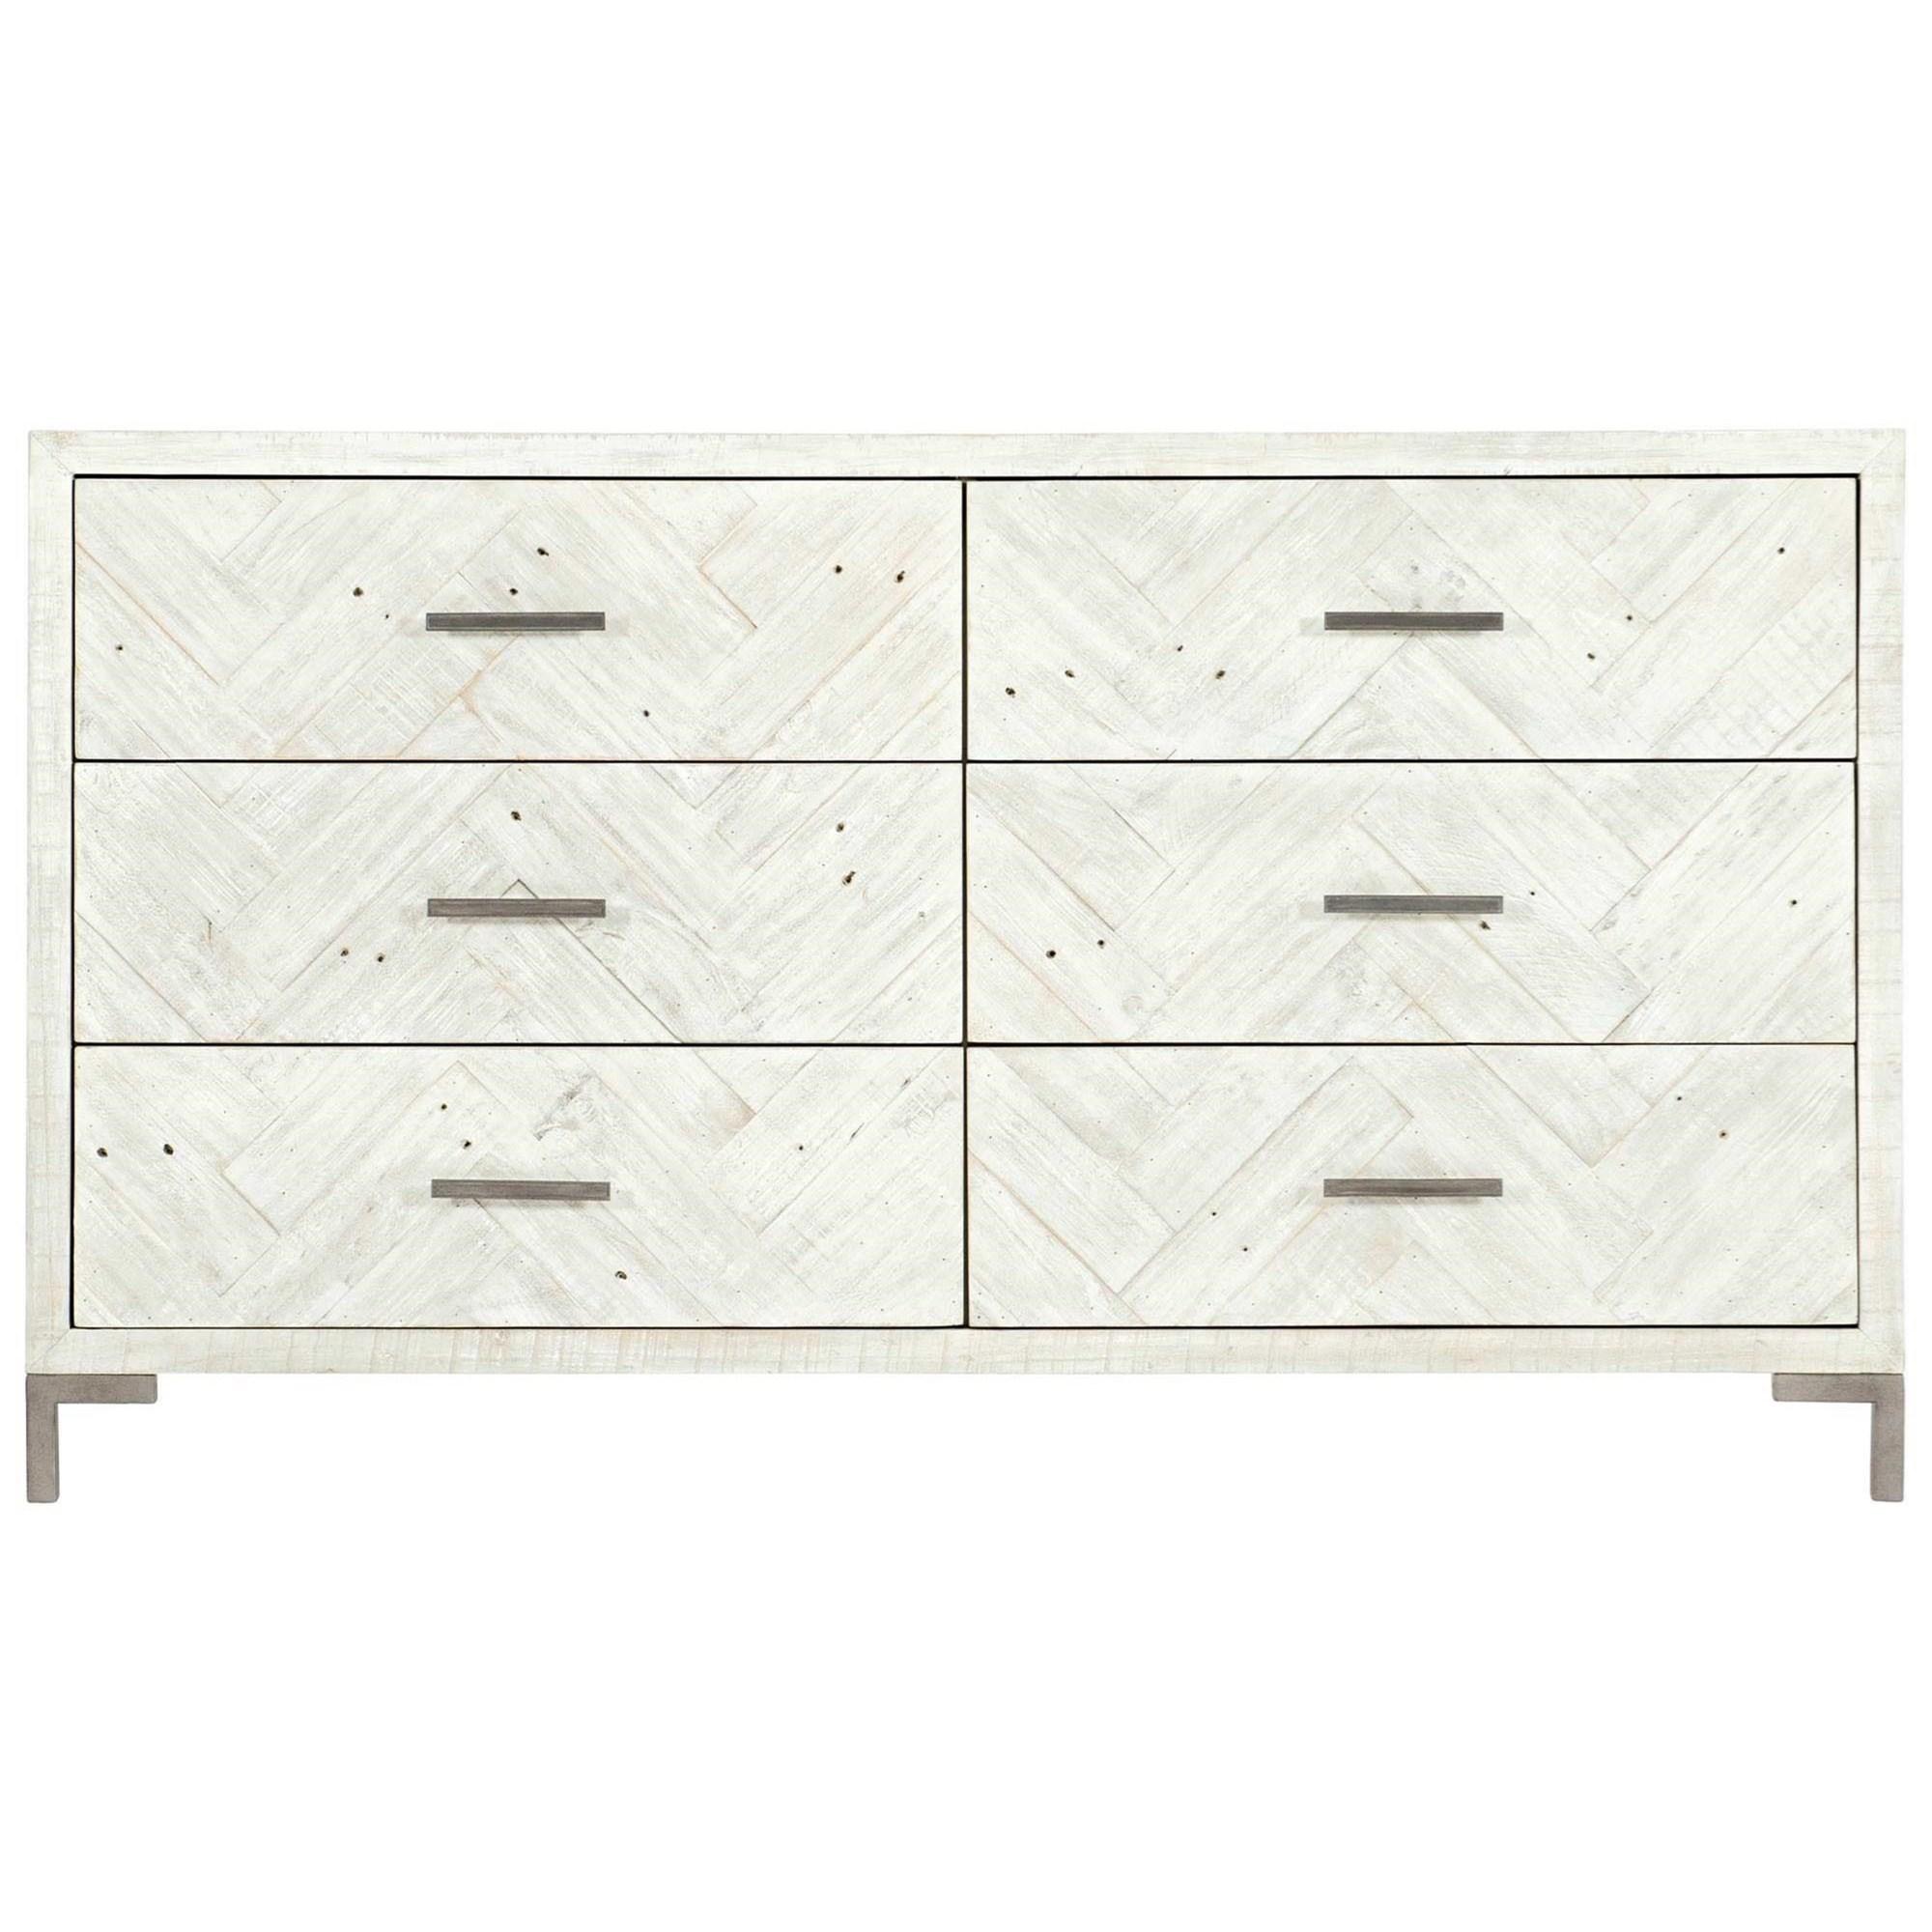 Loft - Highland Park Macauley 6-Drawer Dresser by Bernhardt at Baer's Furniture